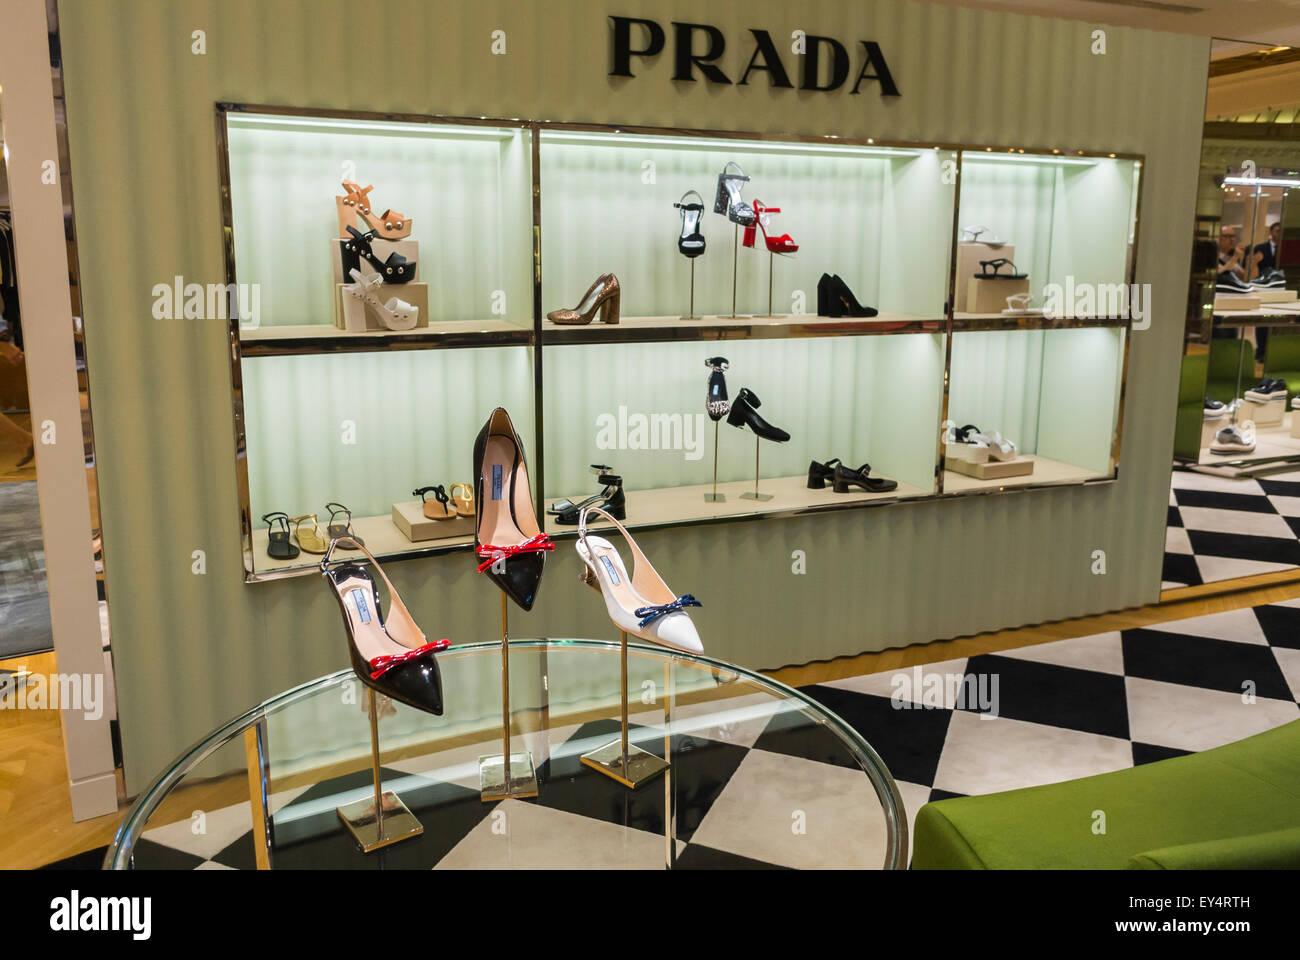 Paris, France, Prada Store Women's Accessories High Heels designer Shoes, on Display, Luxury Fashion Brands Shopping Stock Photo